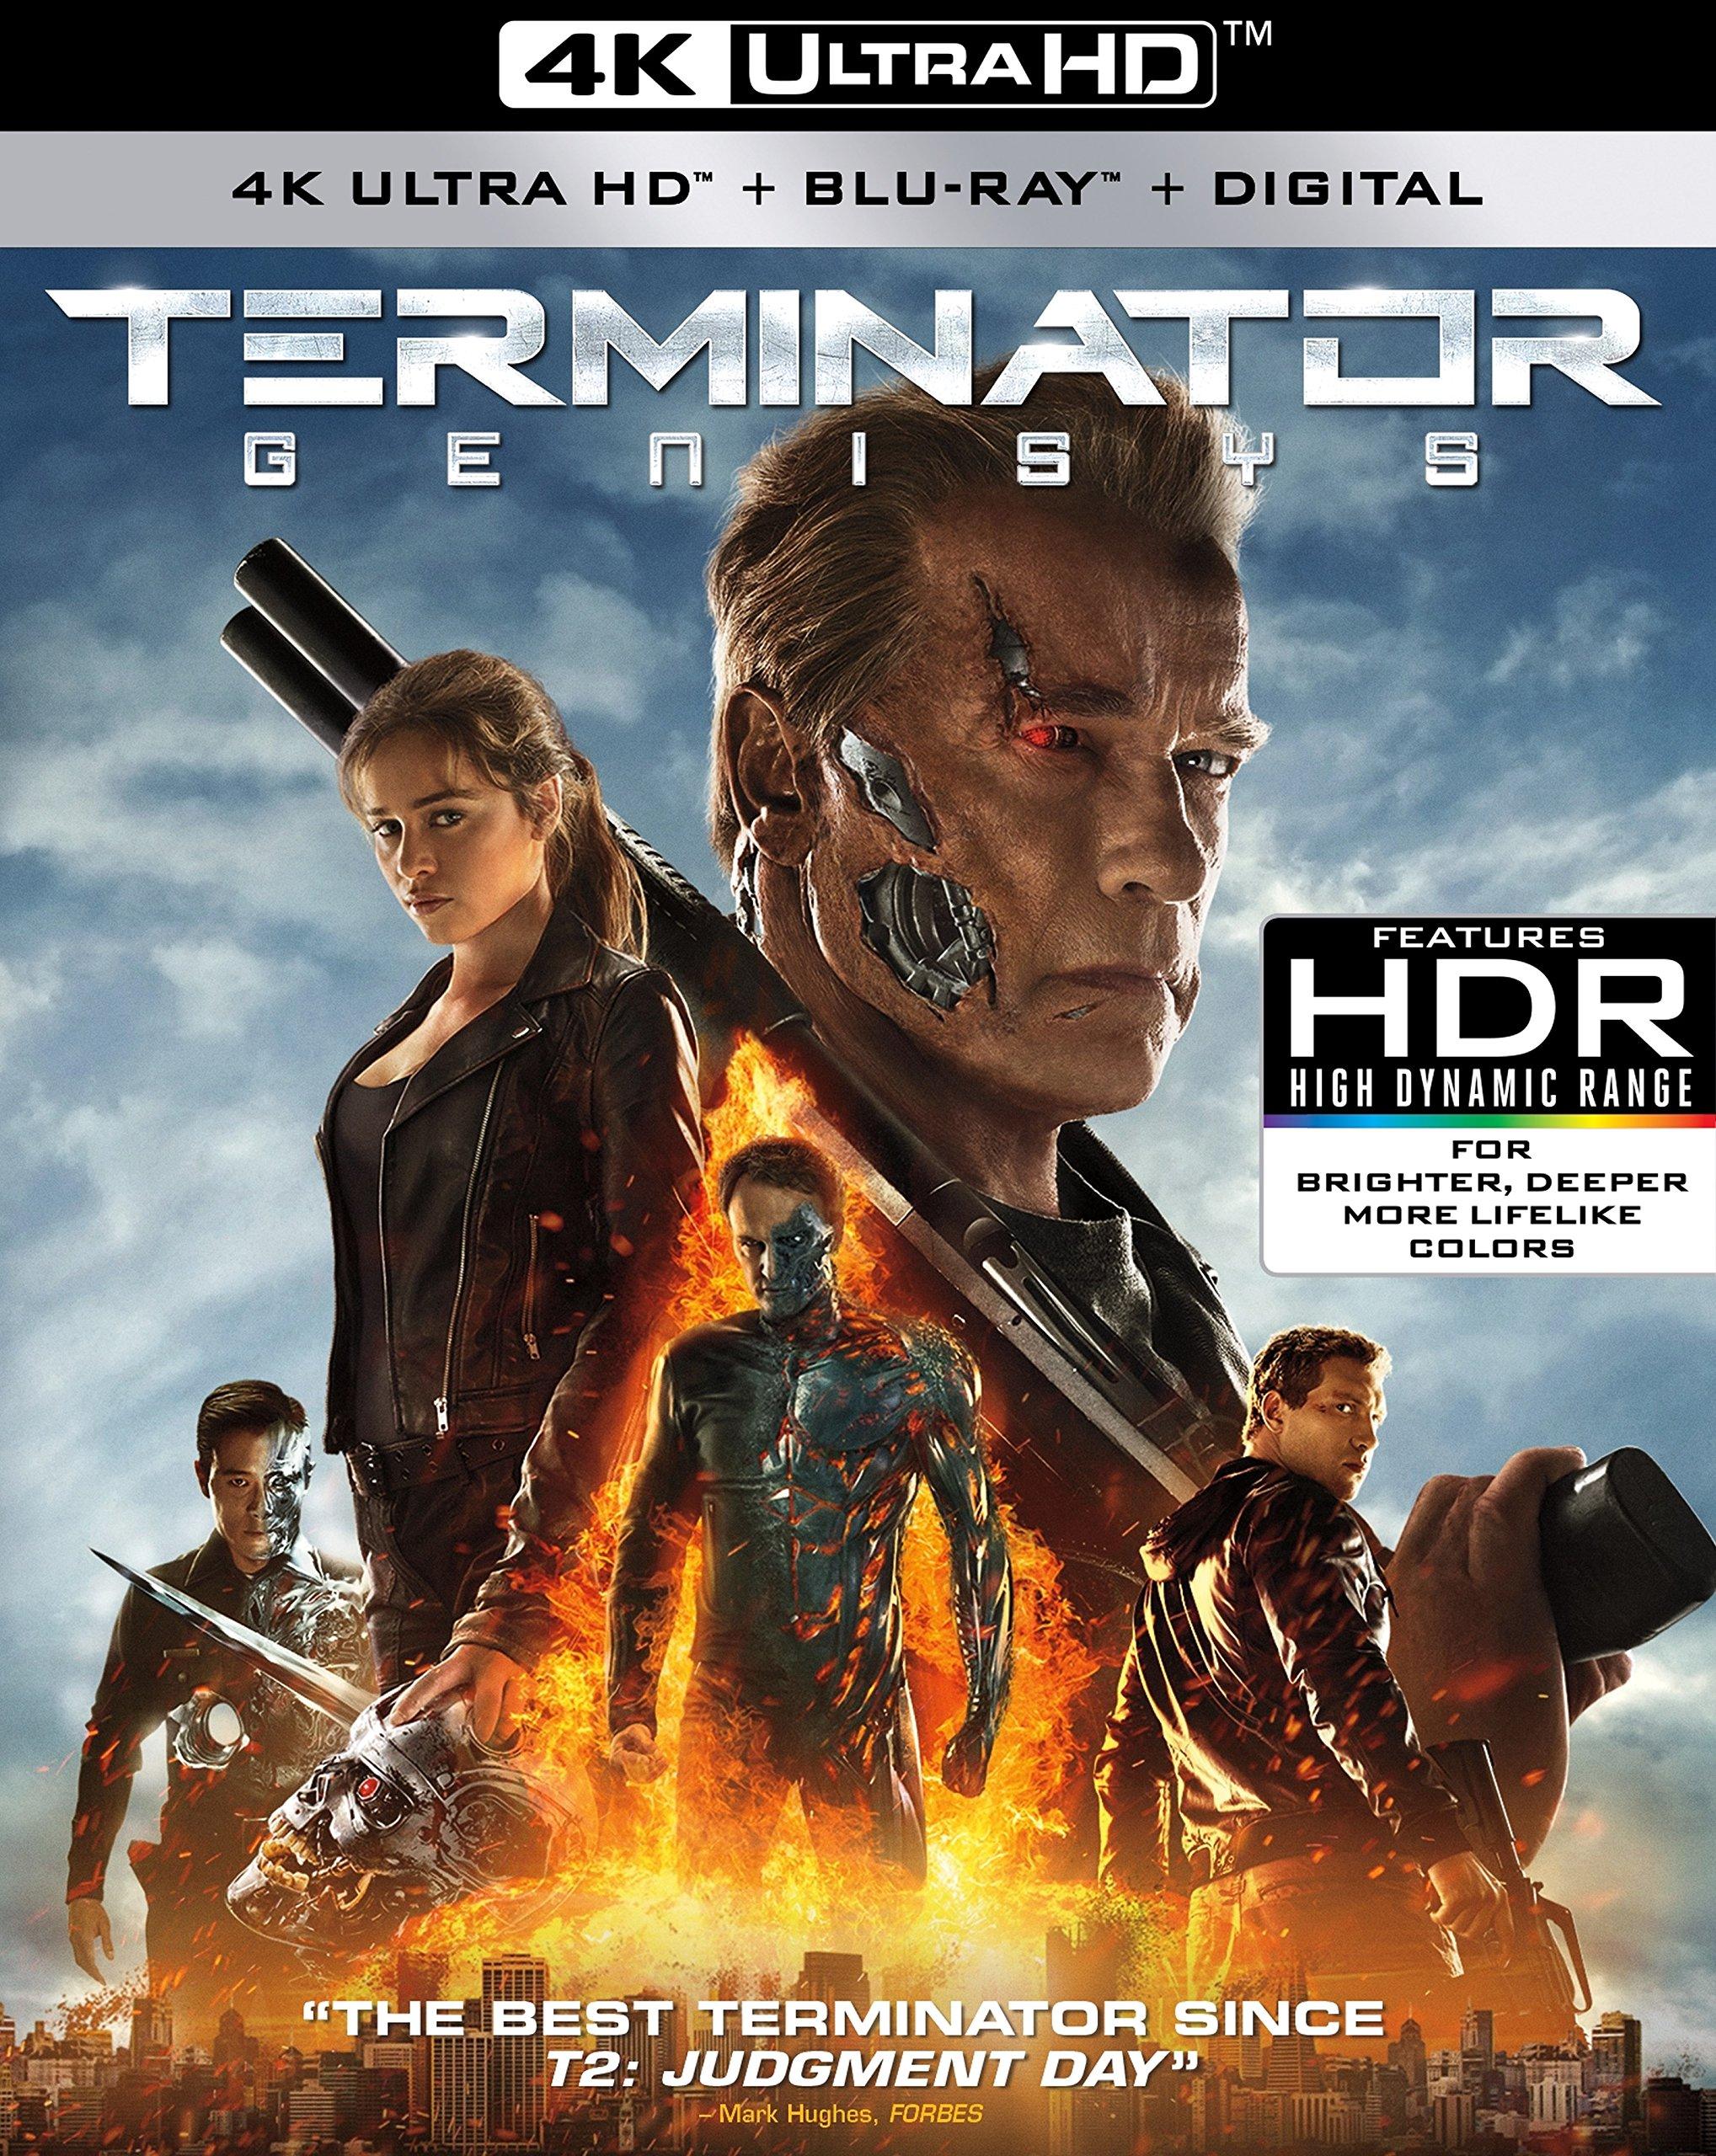 4K Blu-ray : Terminator Genisys (With Blu-Ray, 4K Mastering, Widescreen, Digital Copy, Dolby)